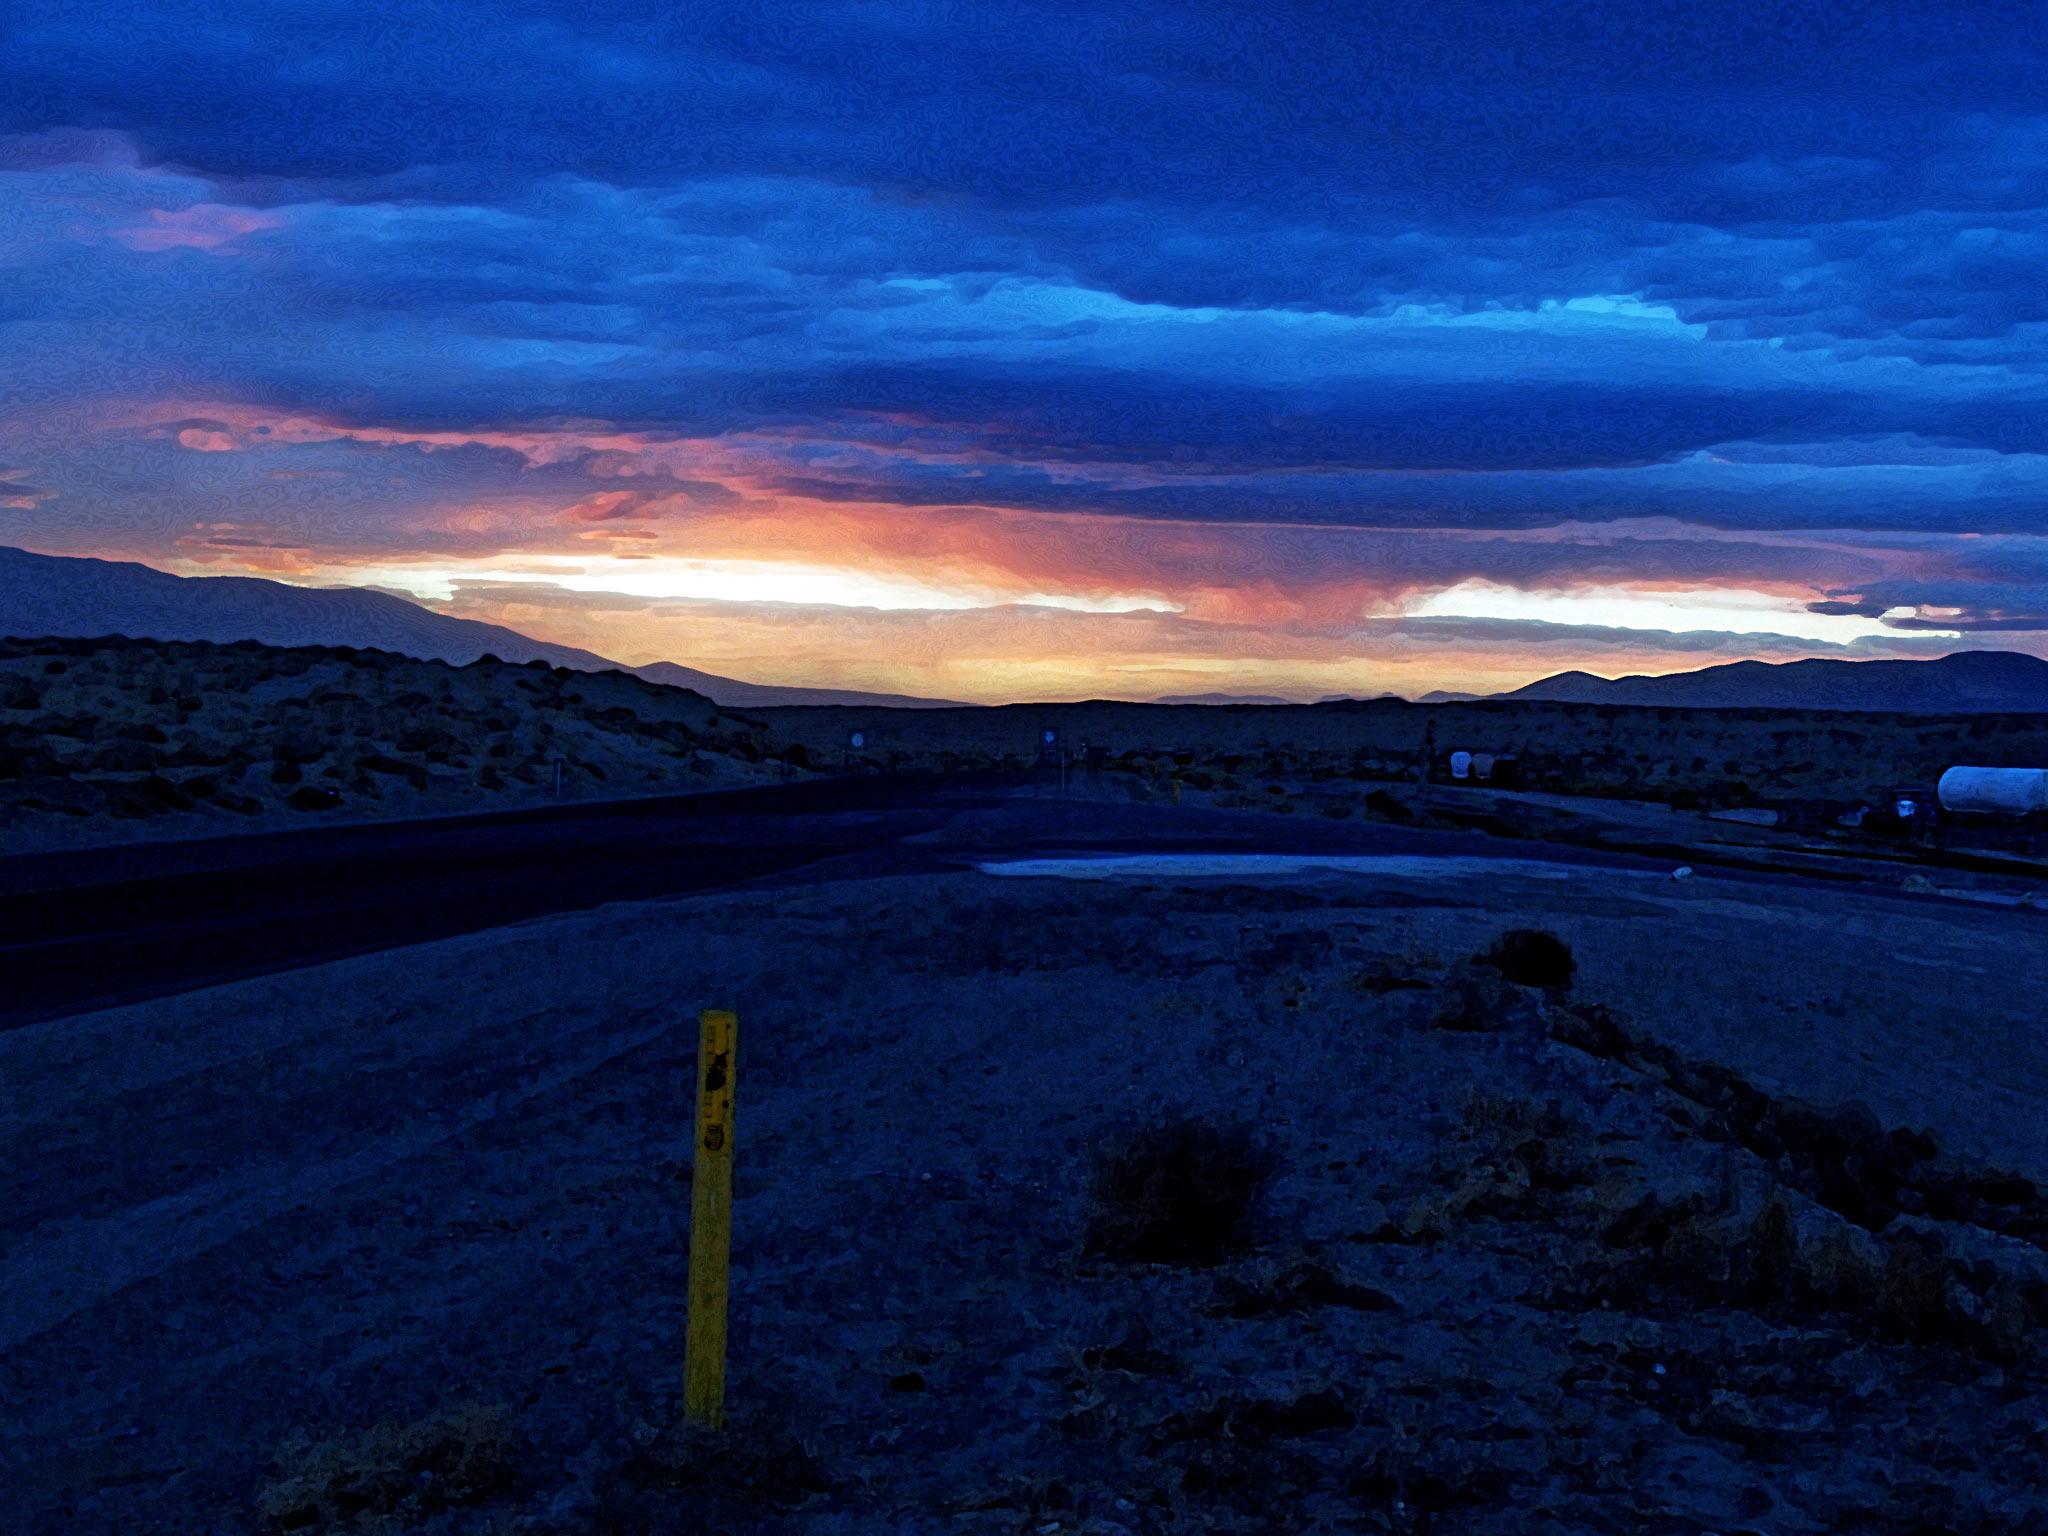 Desert-Sunset-Road-Water-Color_9213242